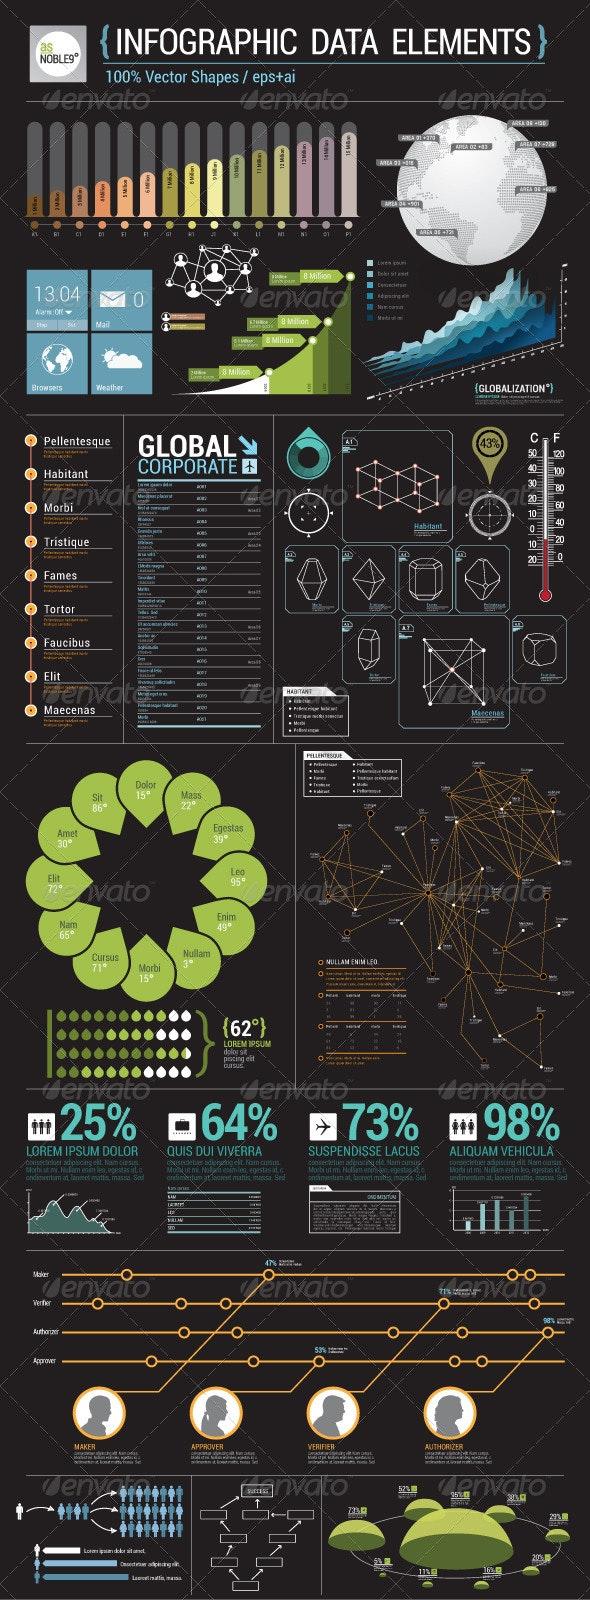 Infographic Data Elements - Infographics